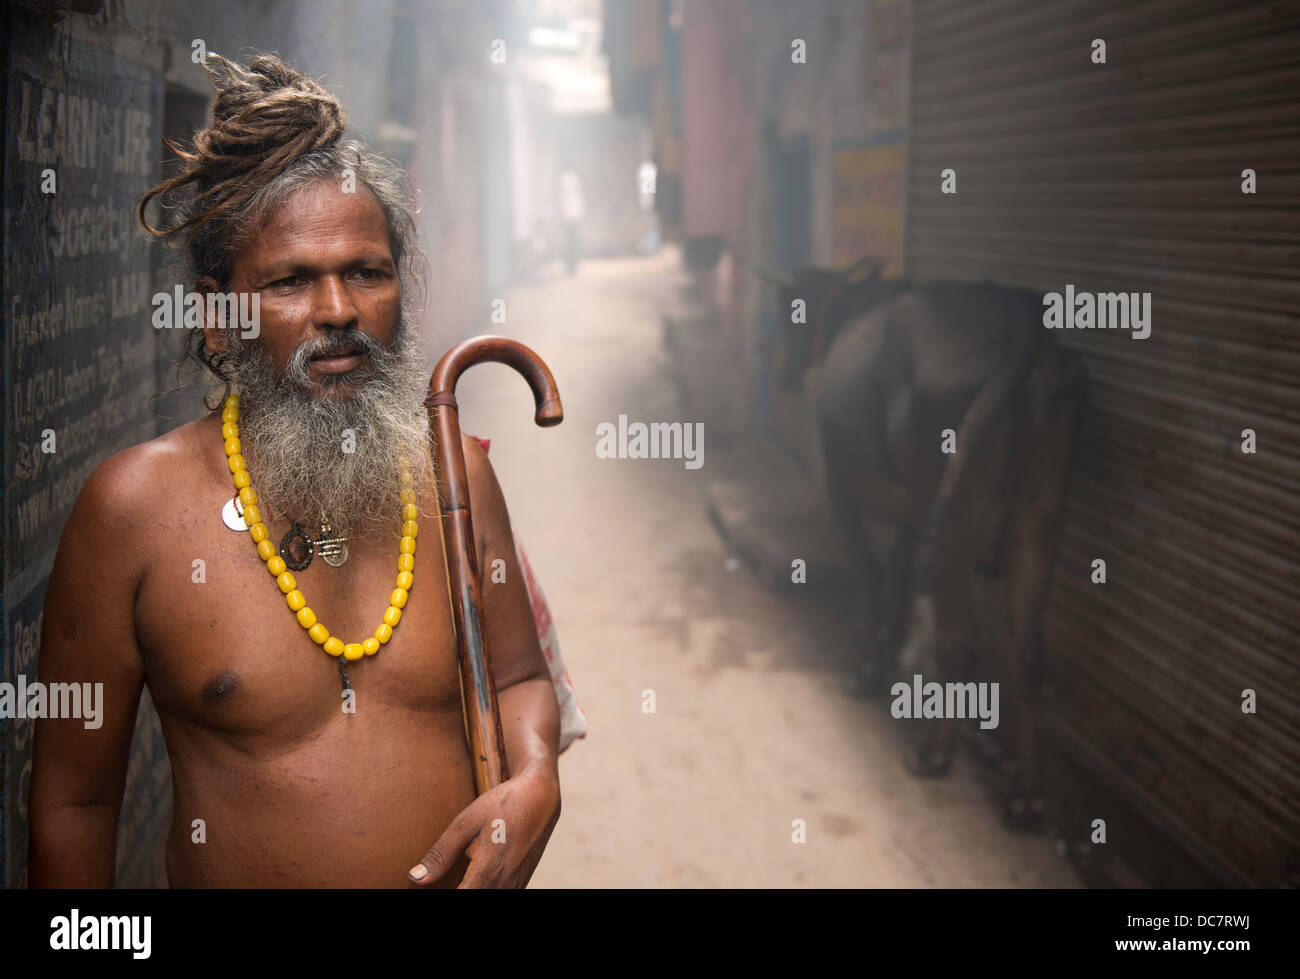 Sadhu, Holy Man and cow off Kachaudi Gali, Varanasi, Uttar Pradesh, India - Stock Image